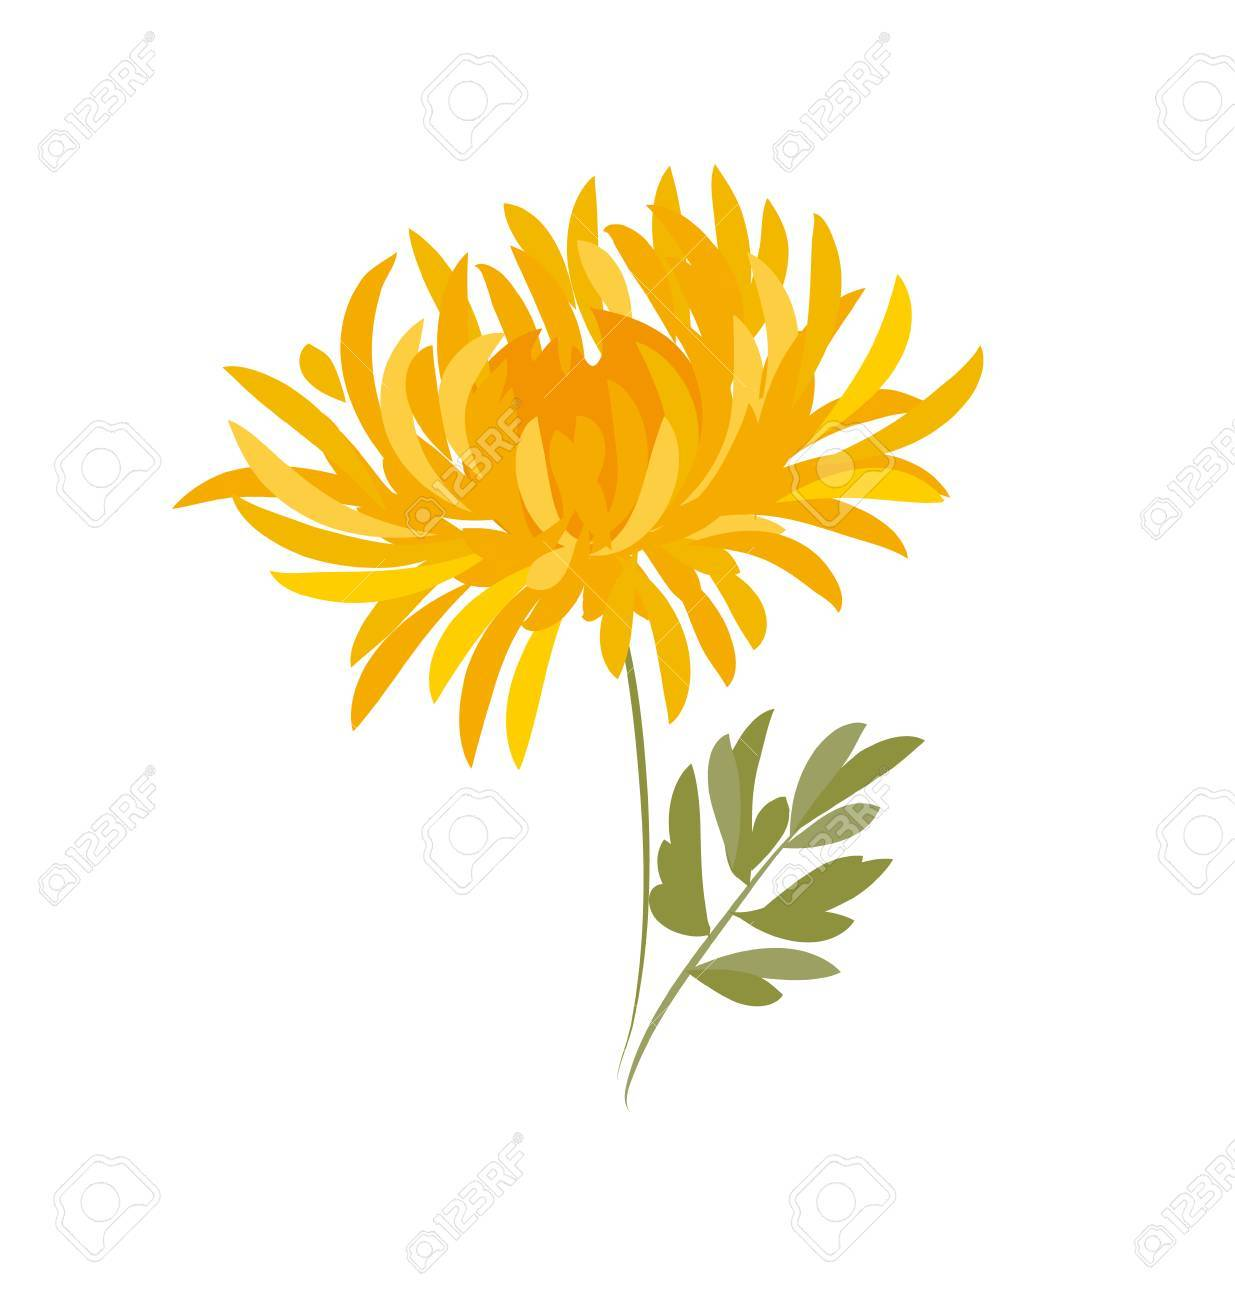 Autumn chrysanthemum flower golden daisy floral vector illustration autumn chrysanthemum flower golden daisy floral vector illustration decorative elegant brightly colored ornamental izmirmasajfo